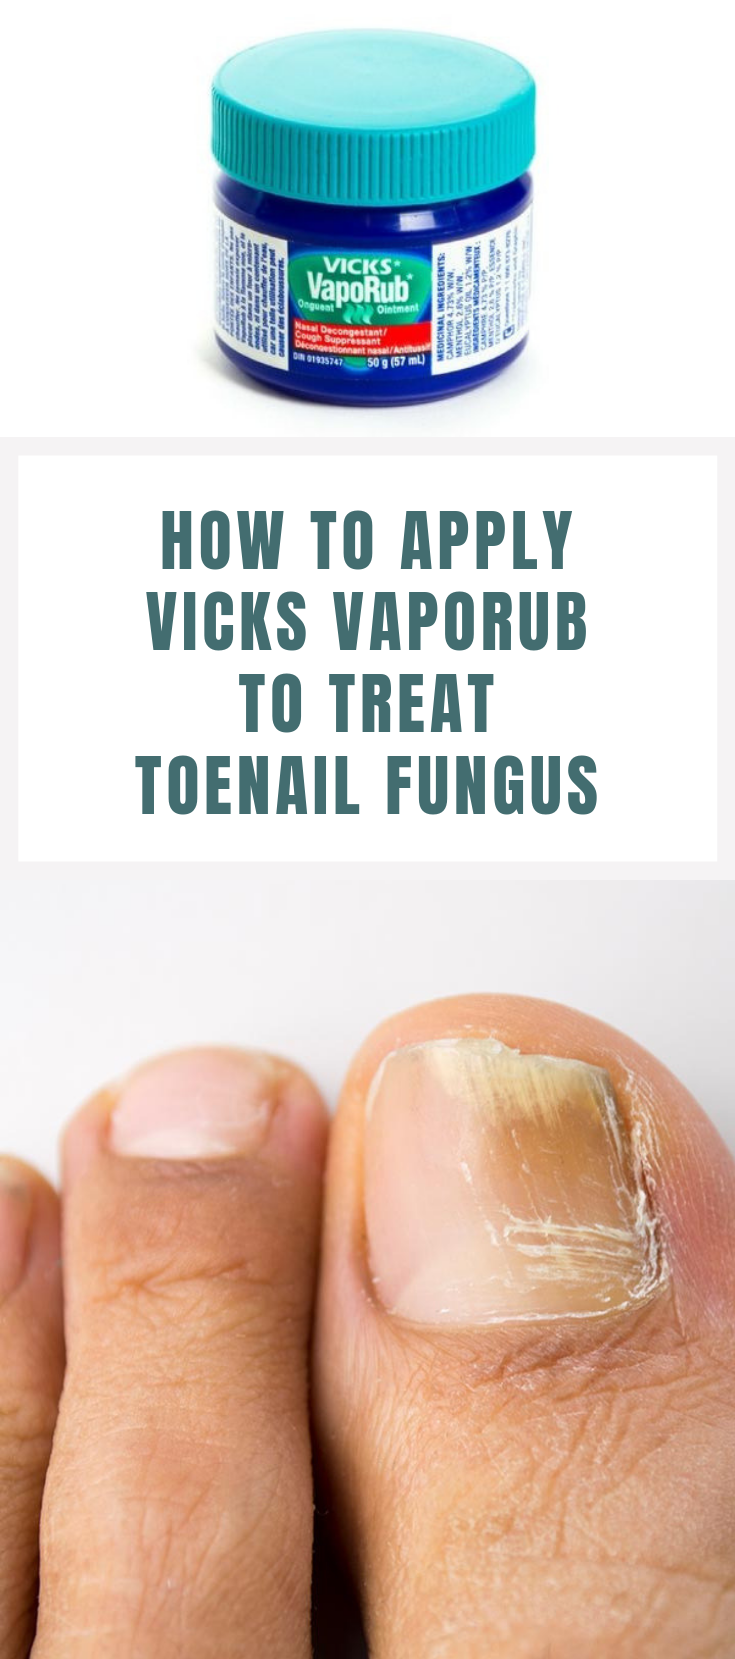 How To Apply Vicks Vaporub To Treat Toenail Fungus Vicks Vaporub